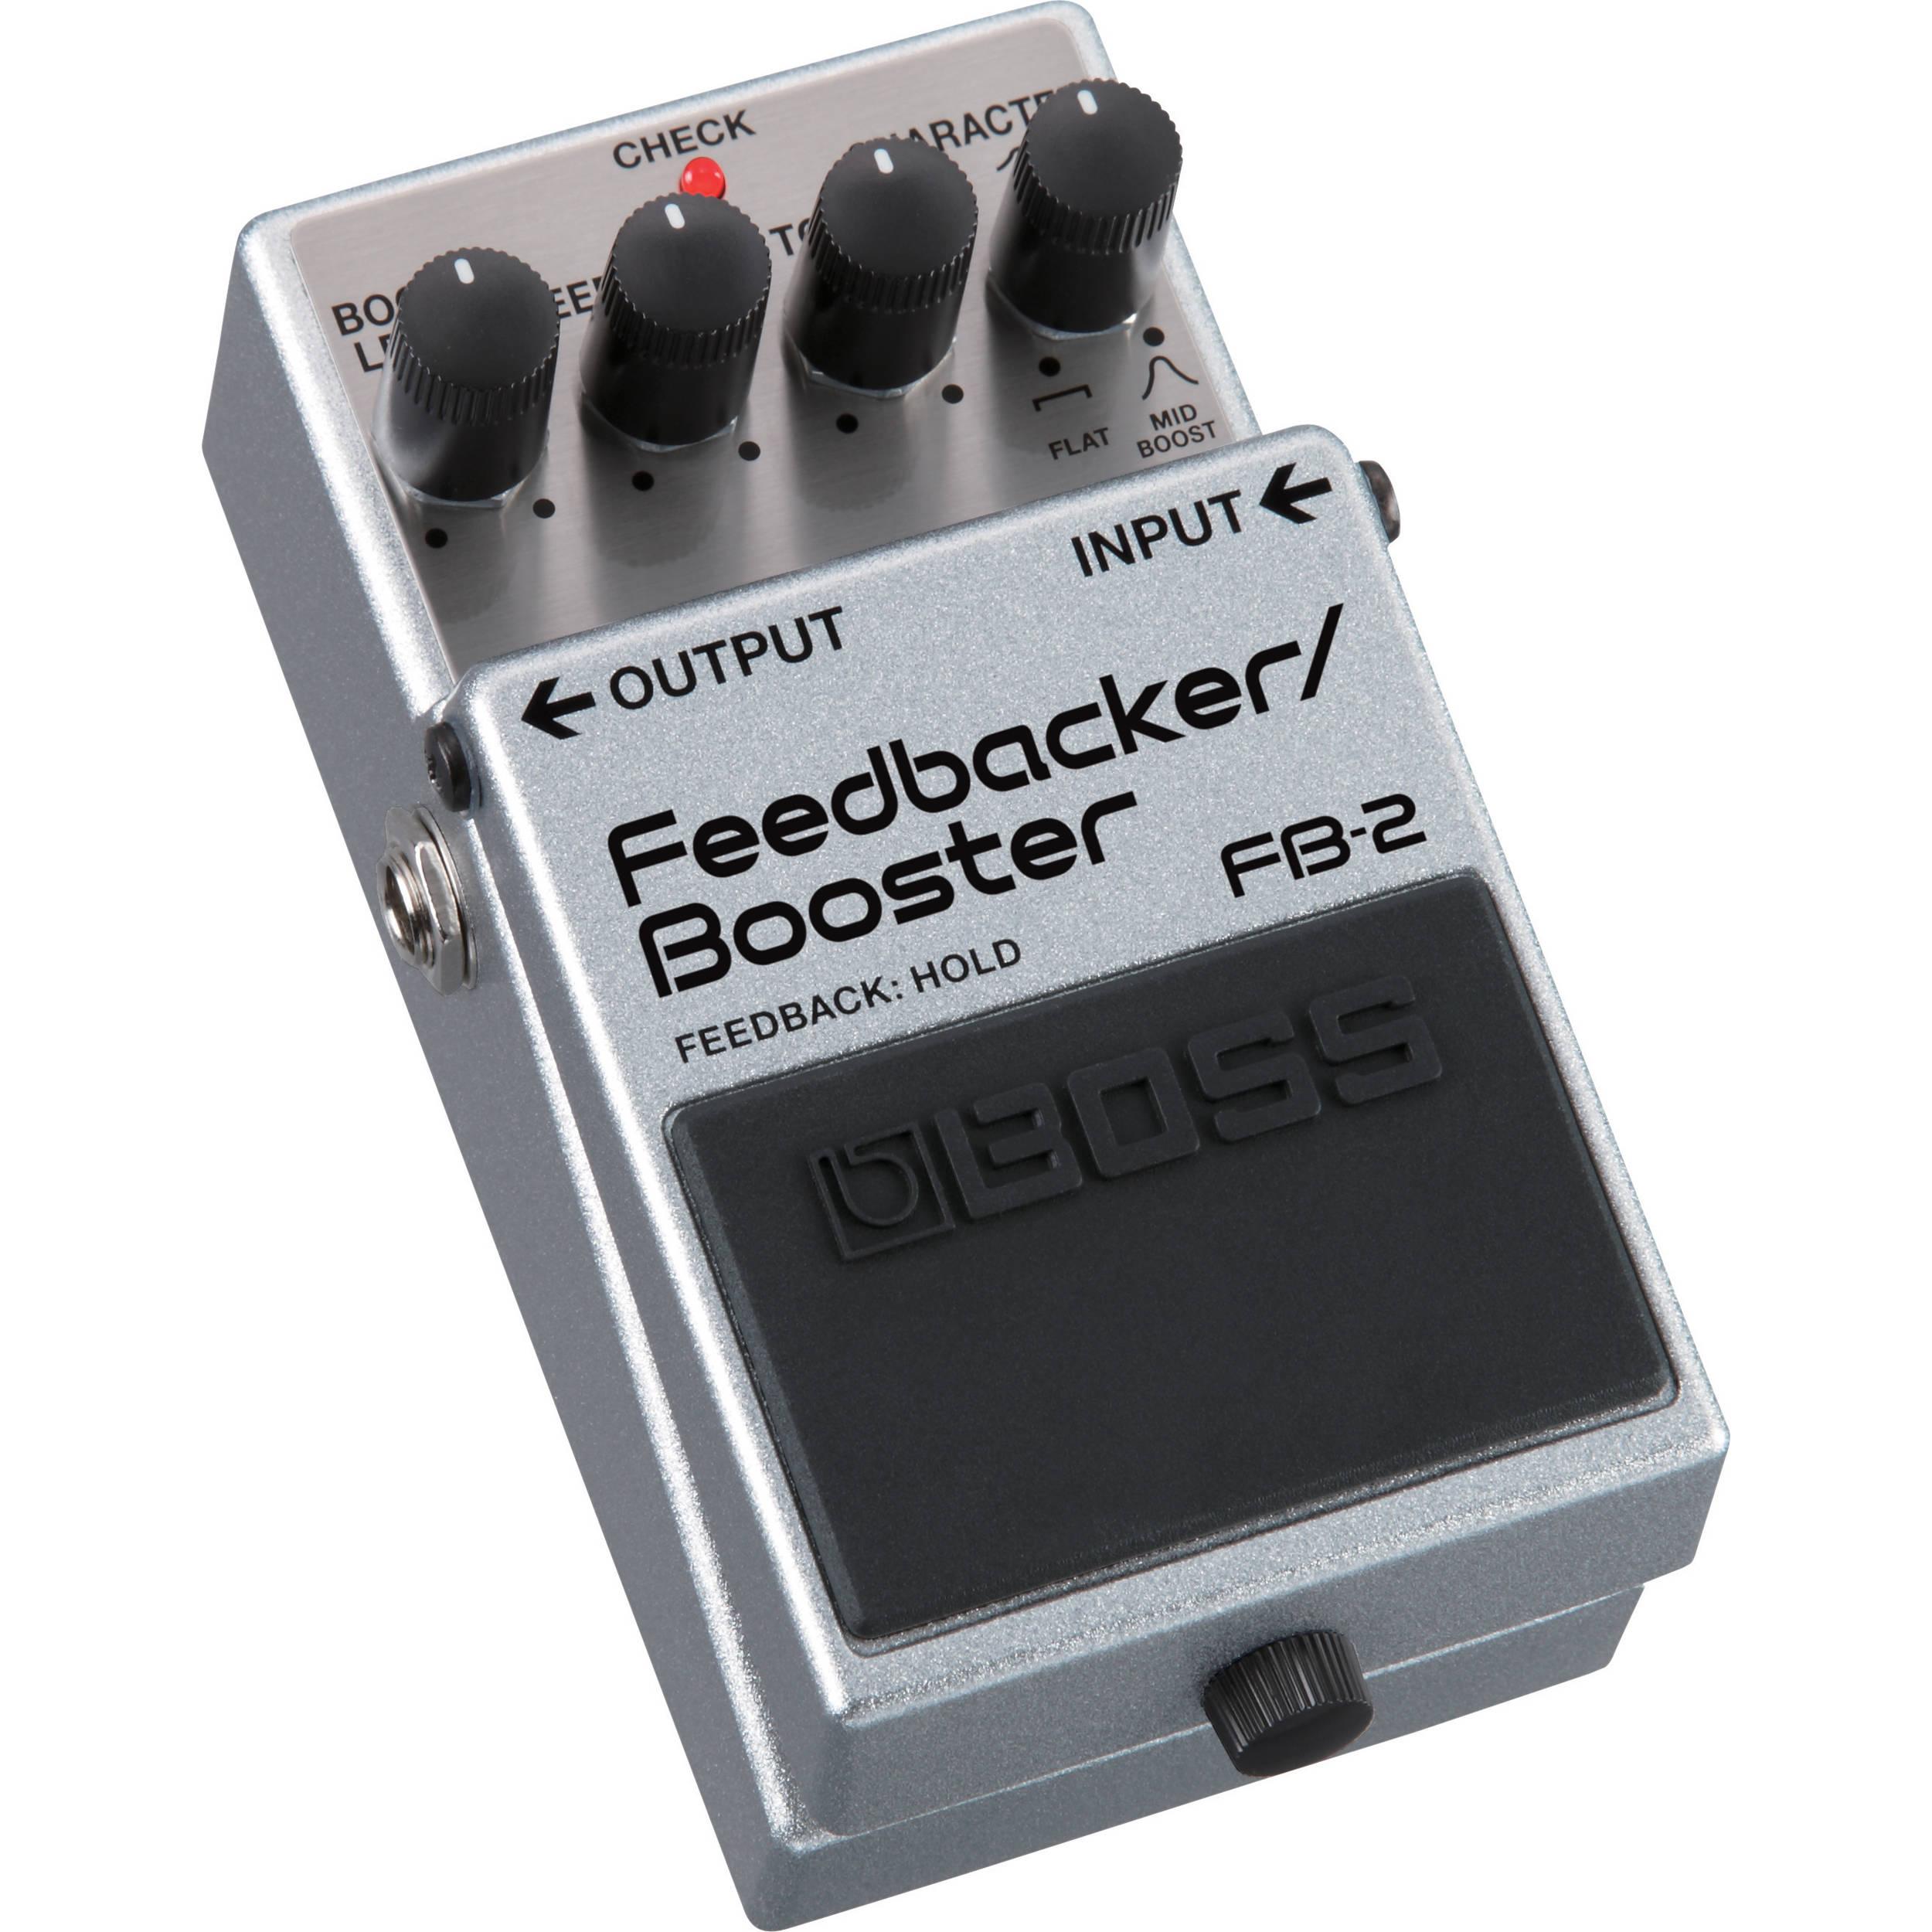 boss fb 2 feedbacker booster guitar pedal fb 2 b h photo video. Black Bedroom Furniture Sets. Home Design Ideas